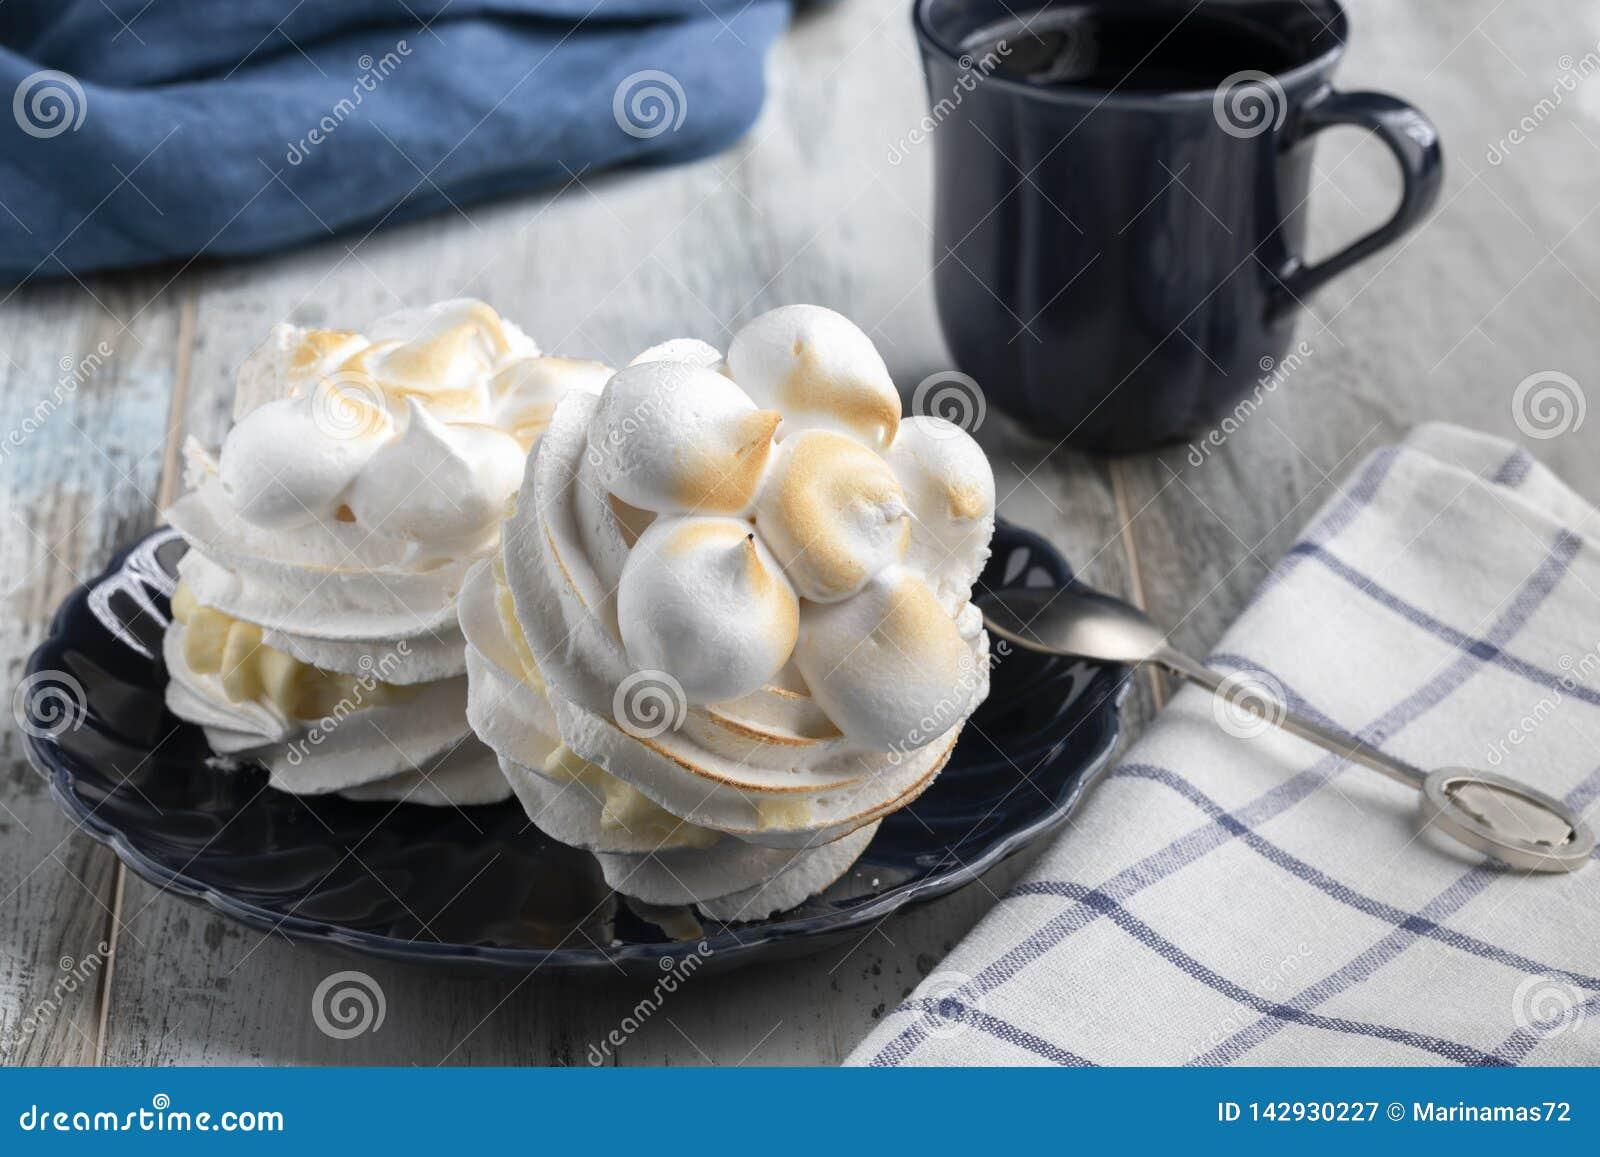 Deserto da merengue de Pavlova